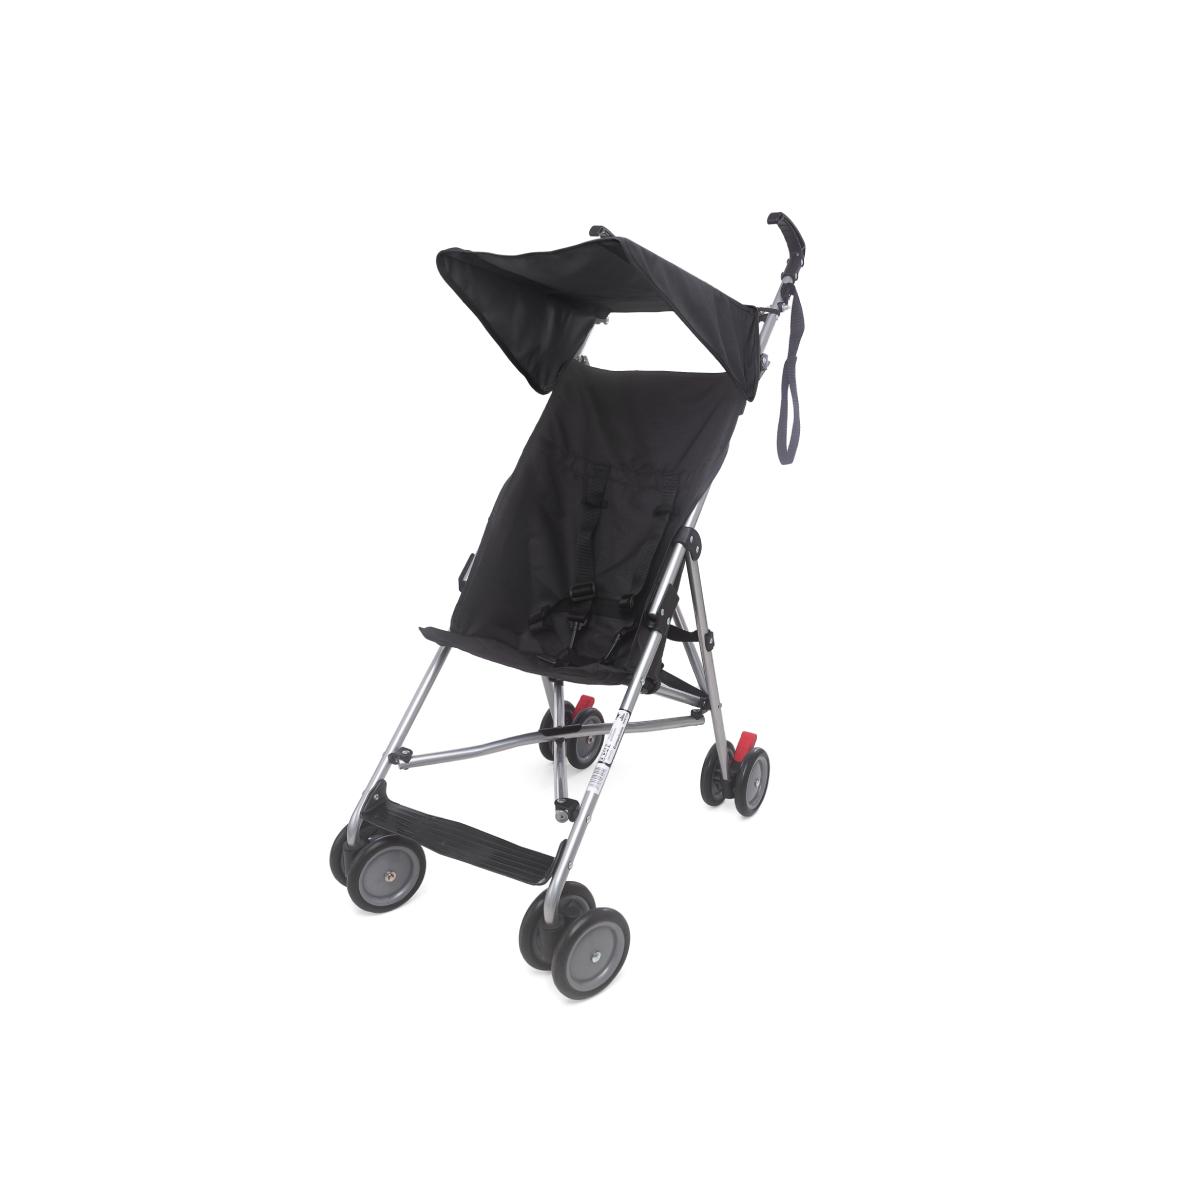 Carrinho Infantil Passeio Compacto Cool Baby Style Preto